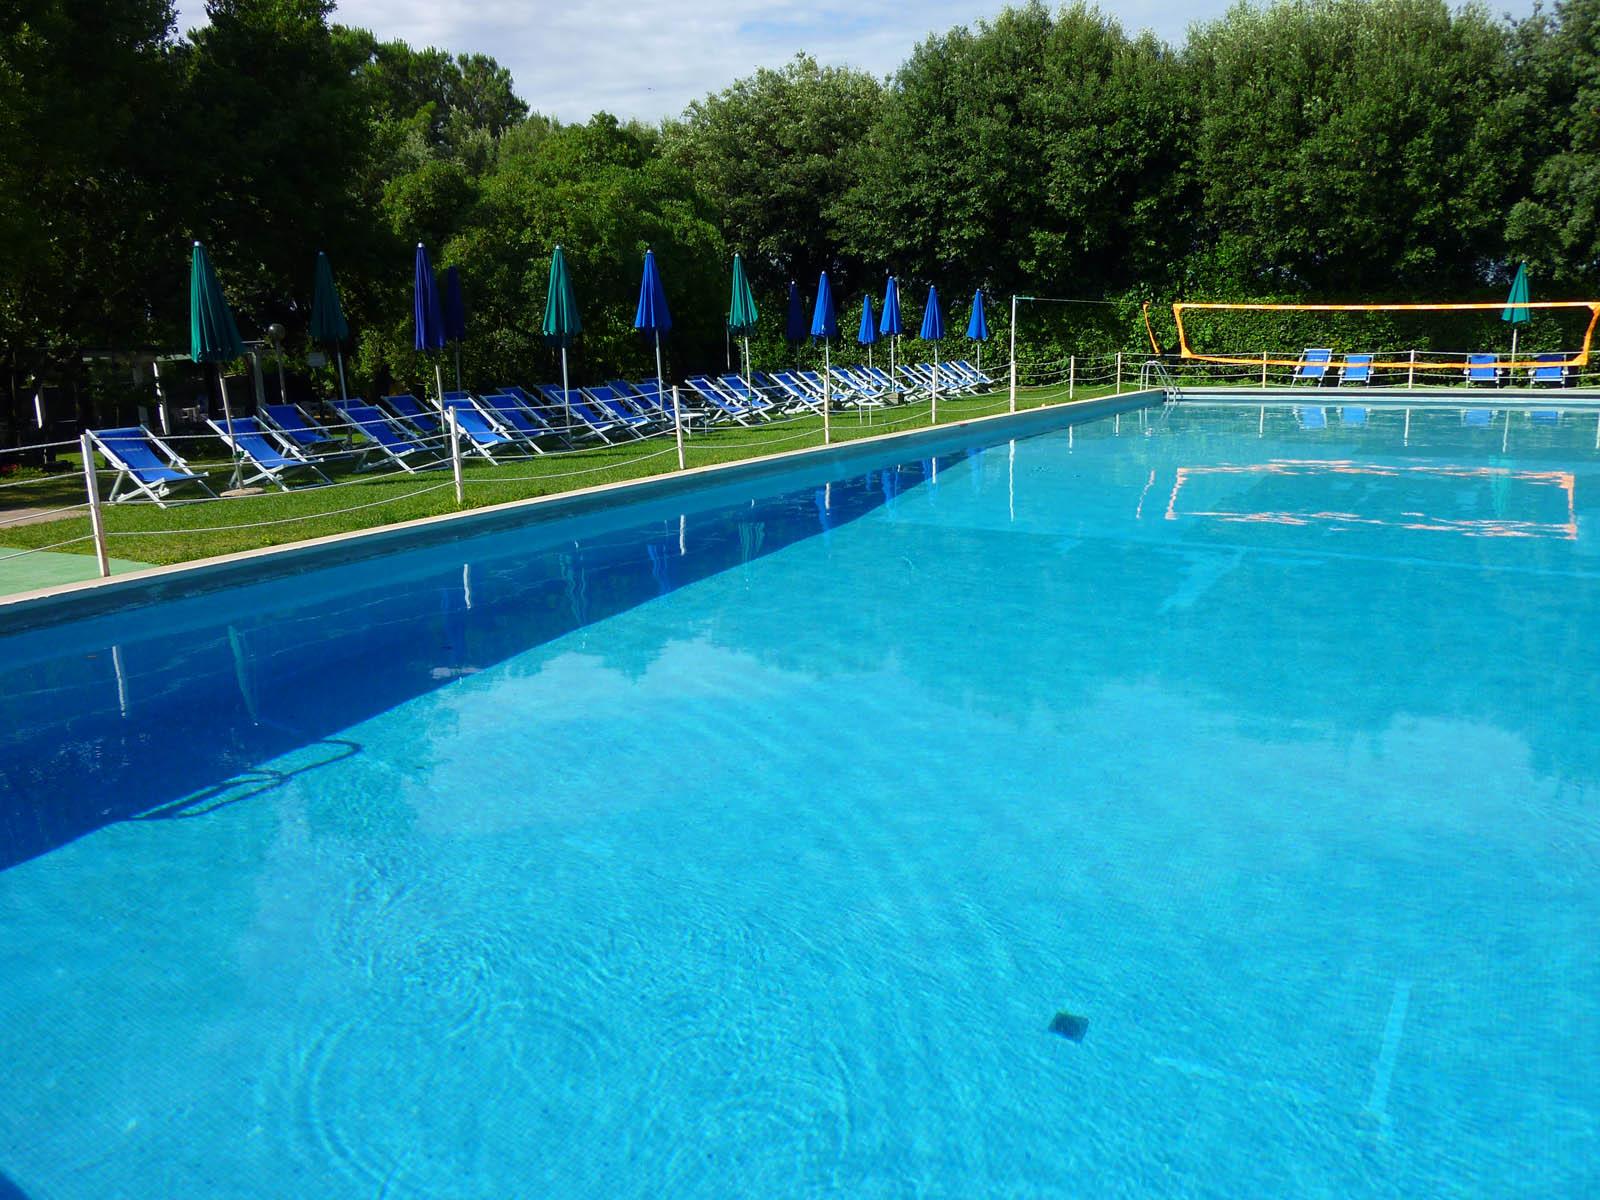 Tor carbone ssd circolo sportivo tor carbone tennis - Palestre con piscina torino ...